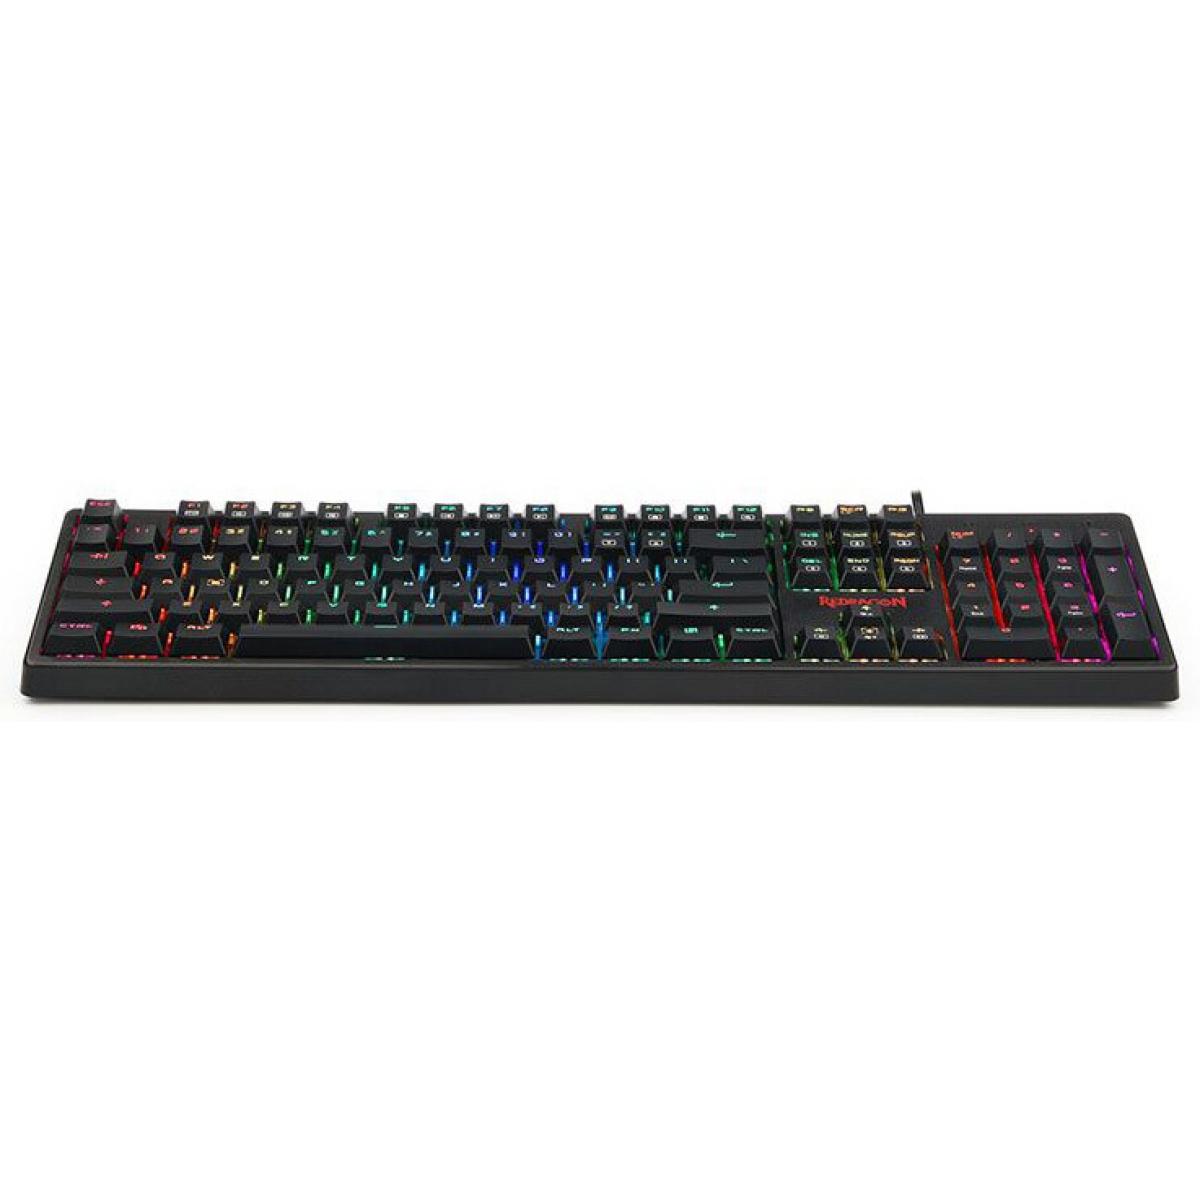 Teclado Mecânico Gamer Redragon Kama, Switch Brown K578 RGB, Black